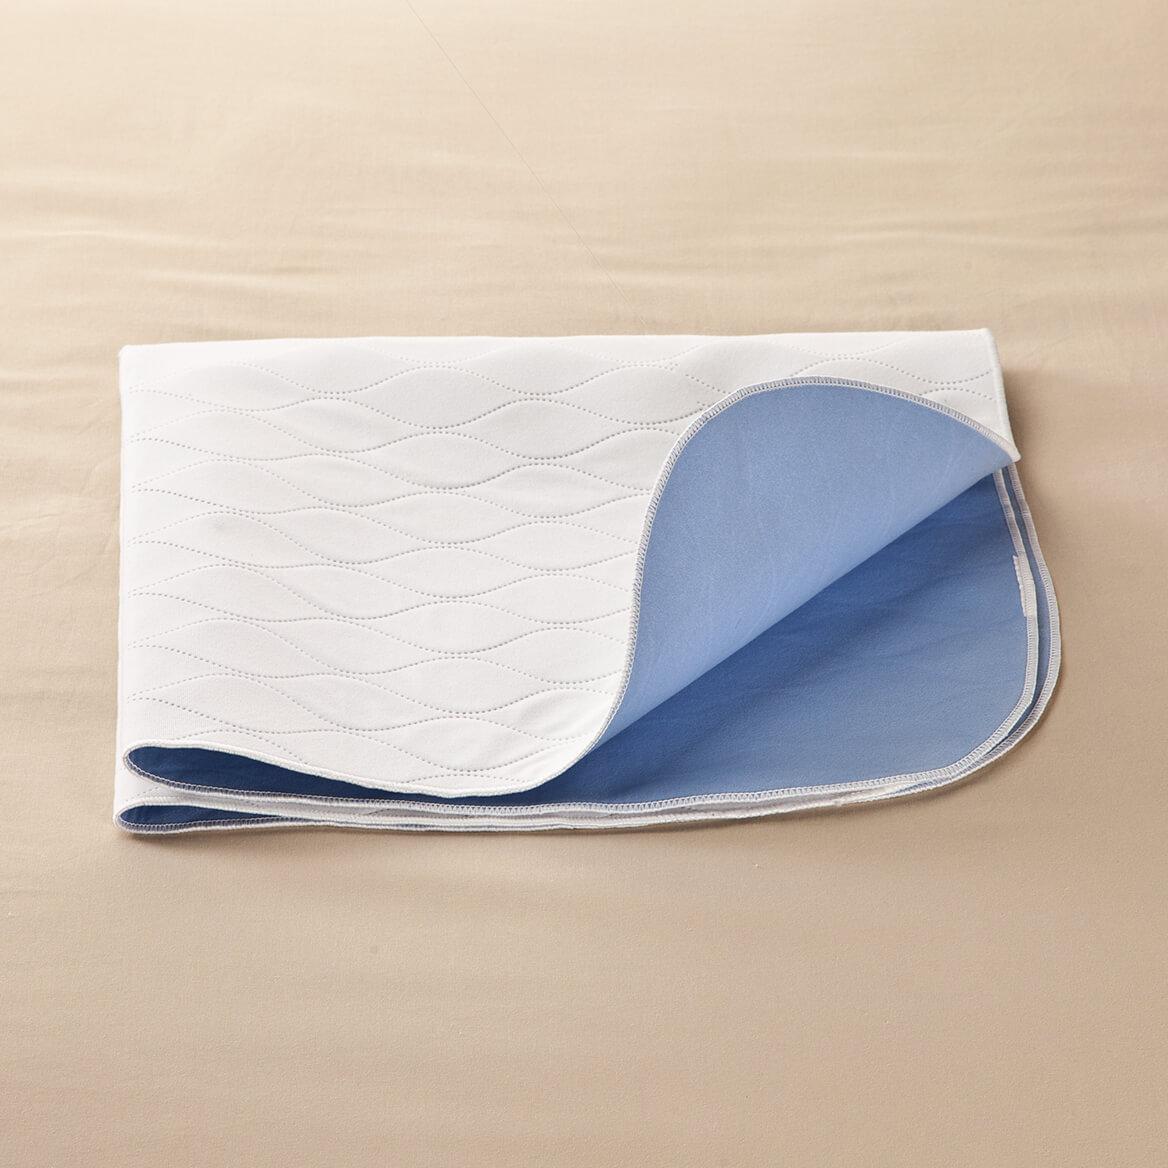 Premium Reusable Incontinence Underpad-360079